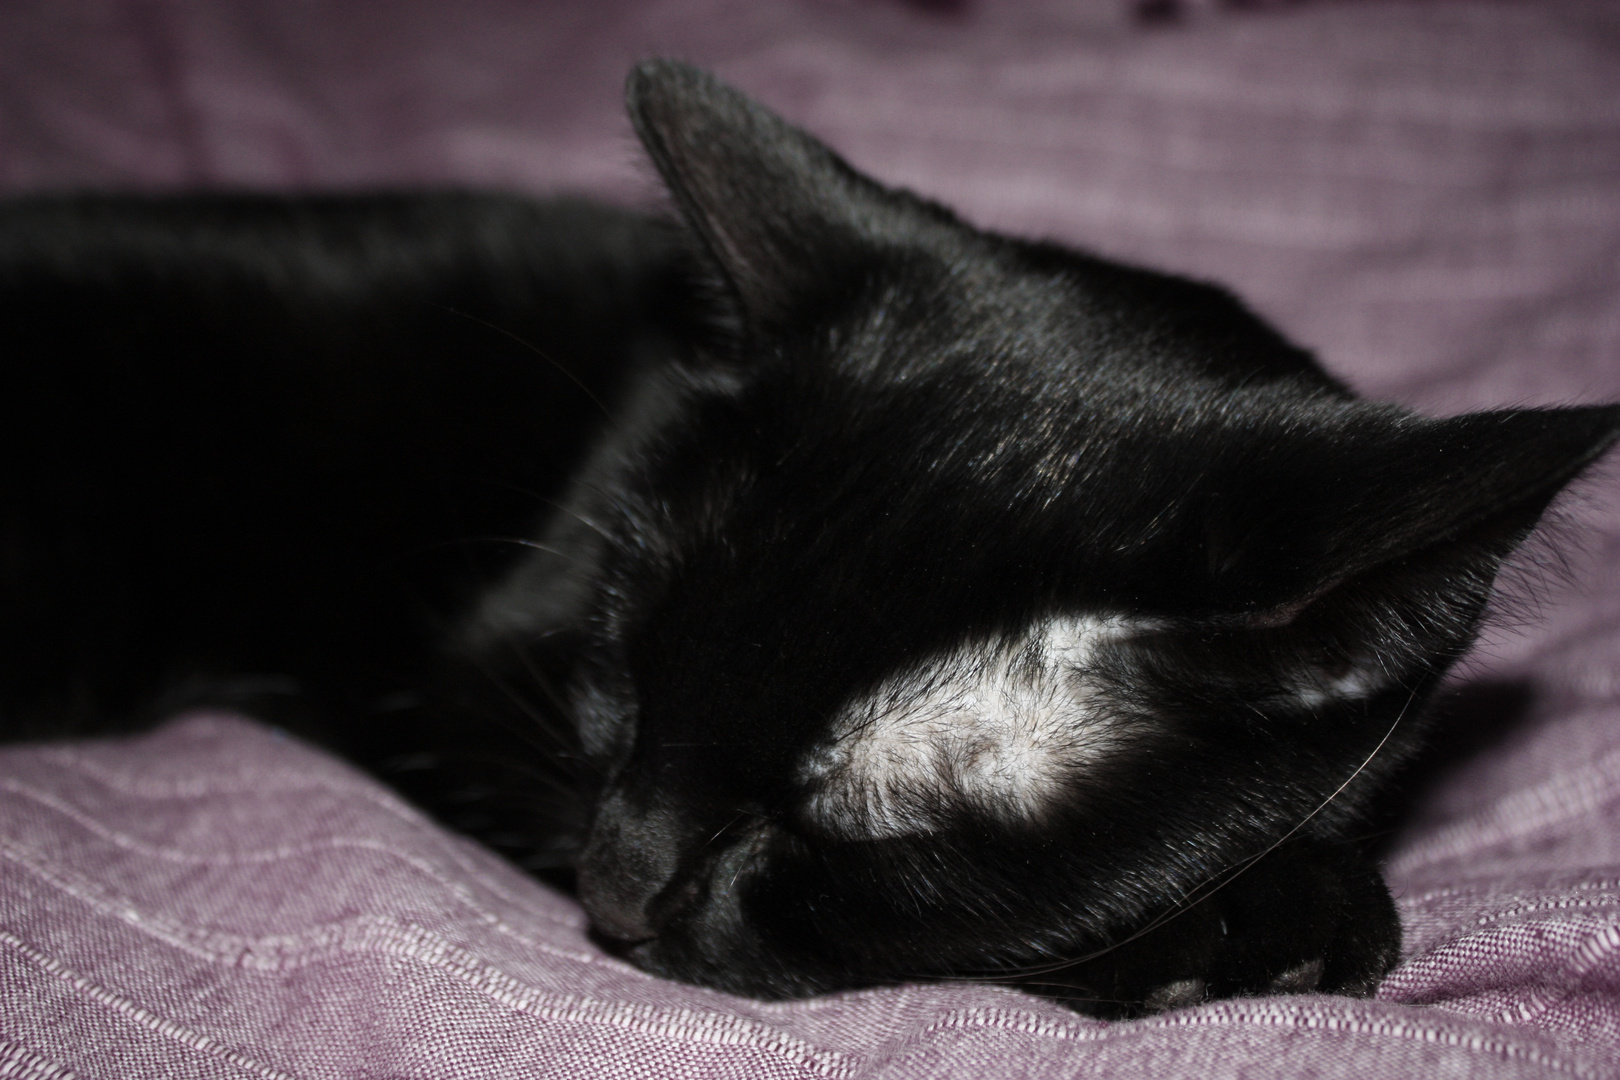 while she was sleeping..